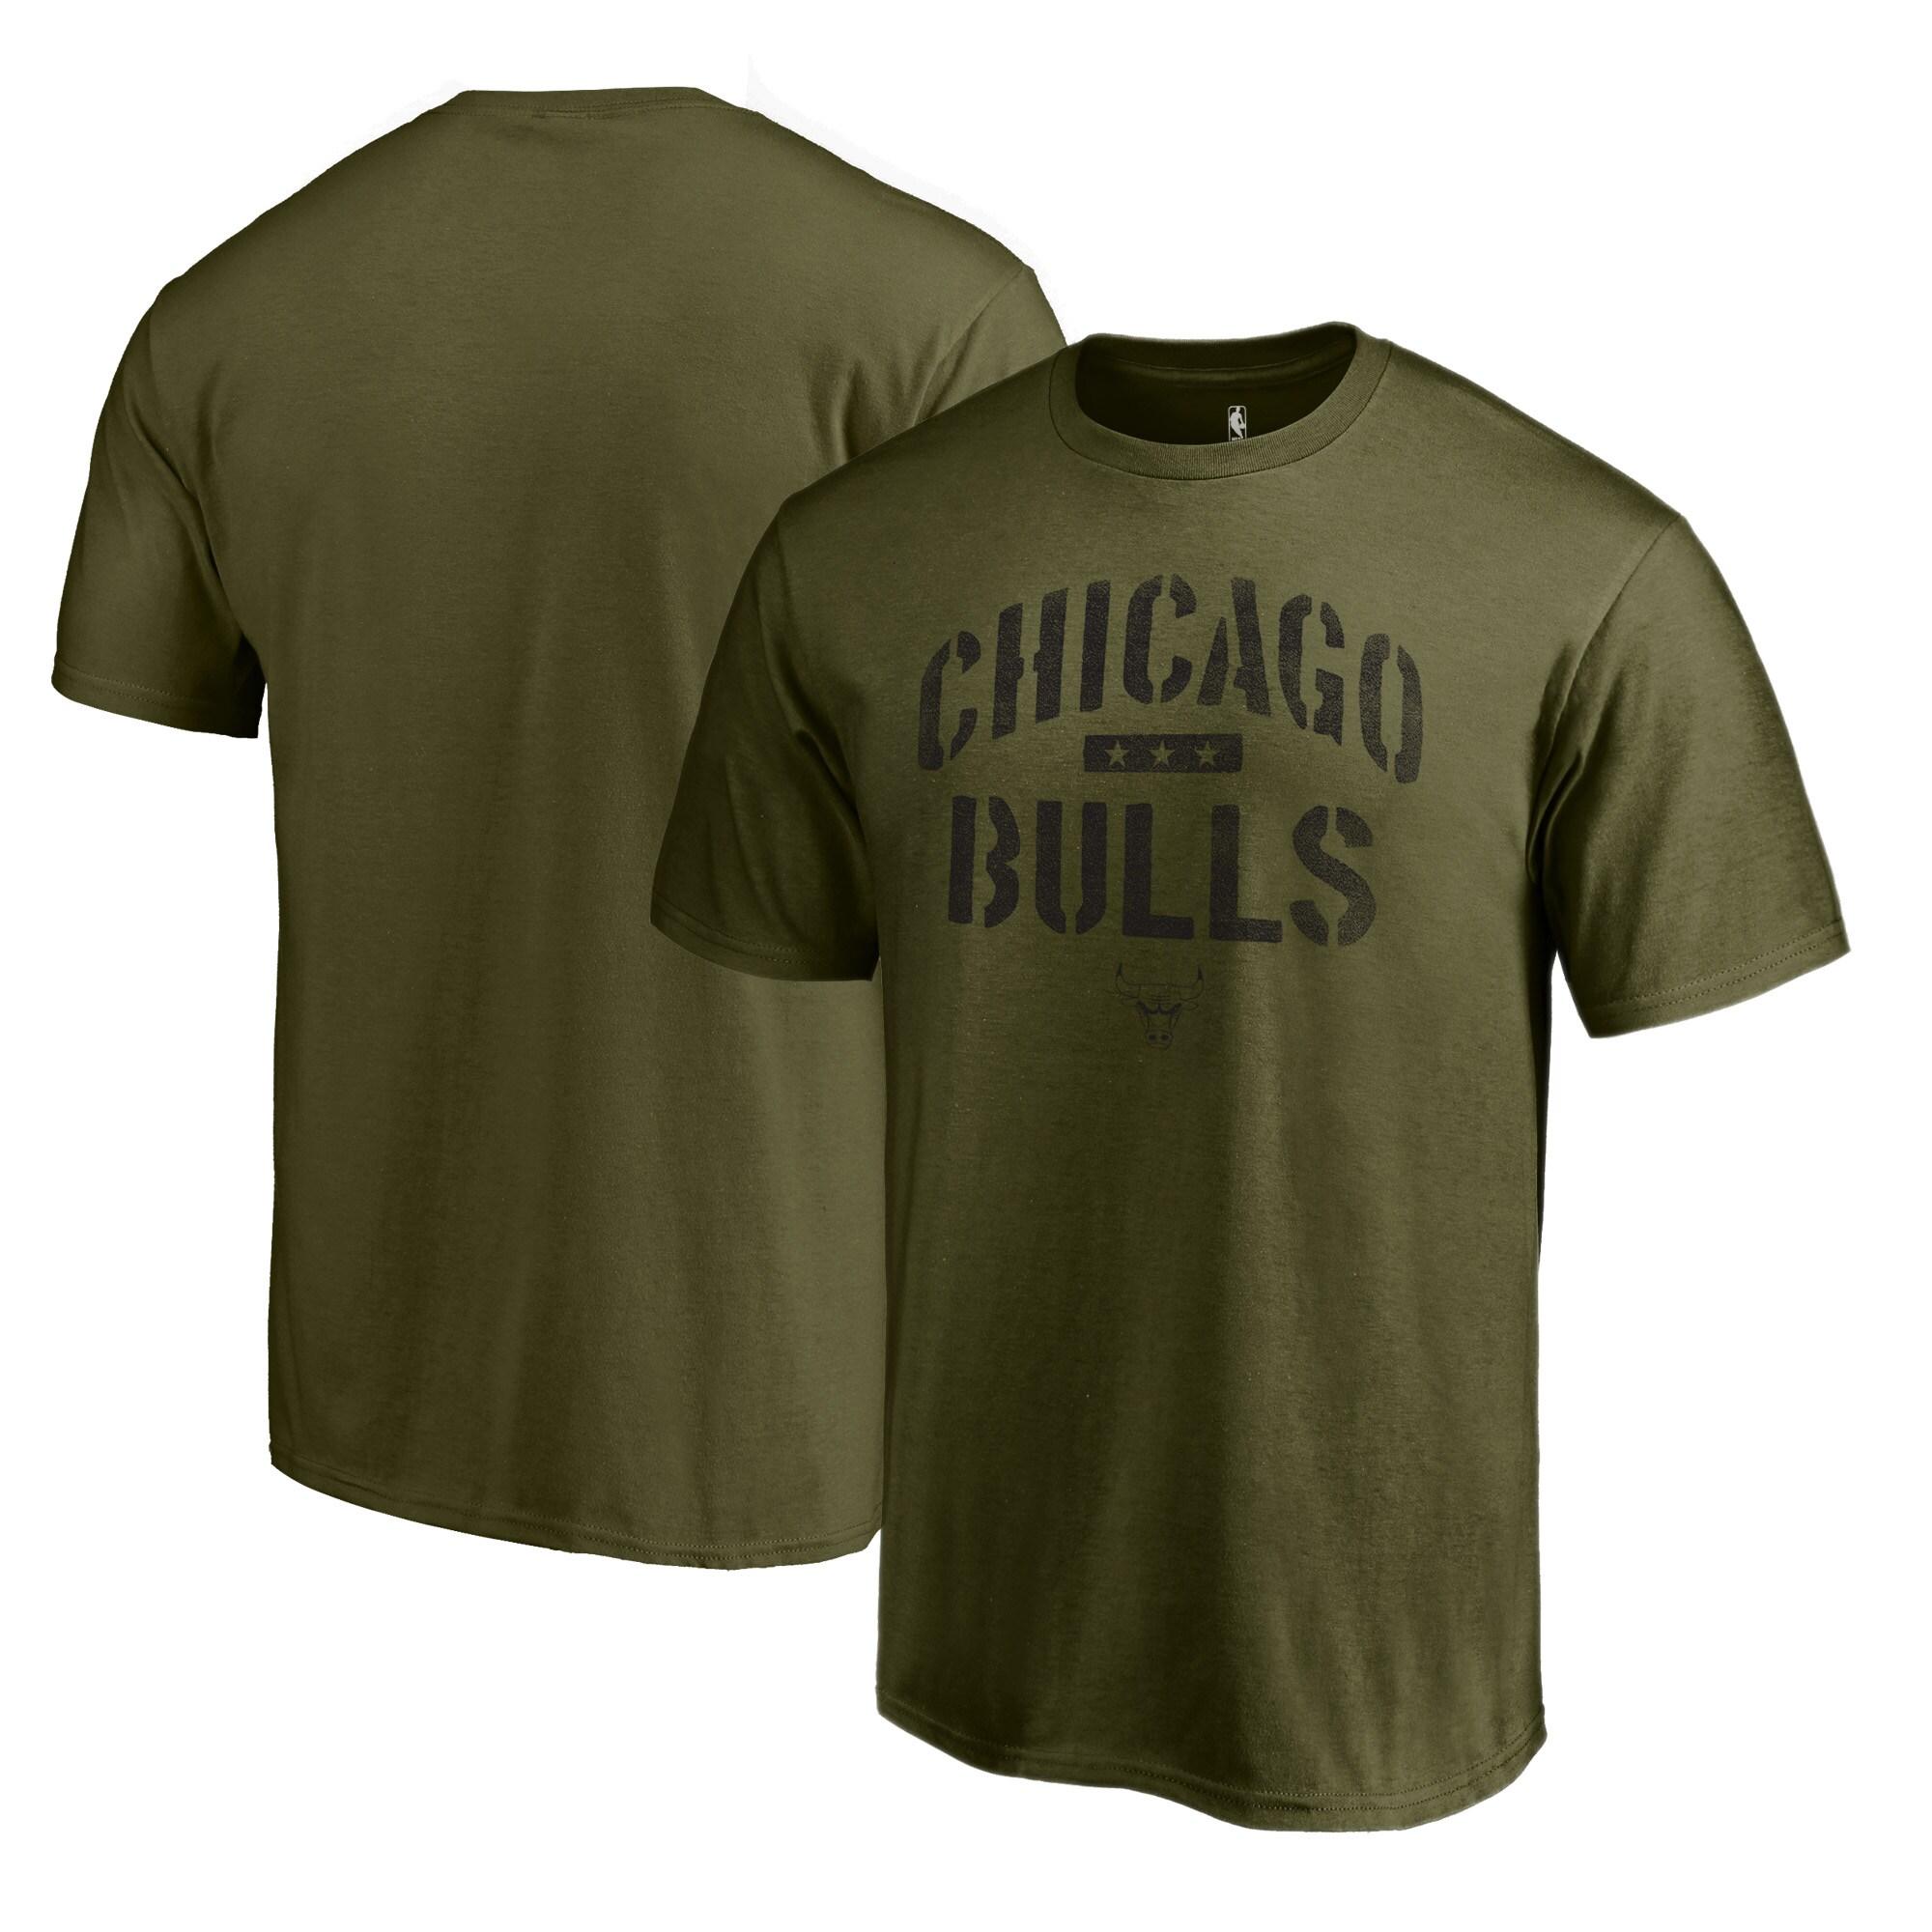 Chicago Bulls Fanatics Branded Camo Collection Jungle T-Shirt - Green